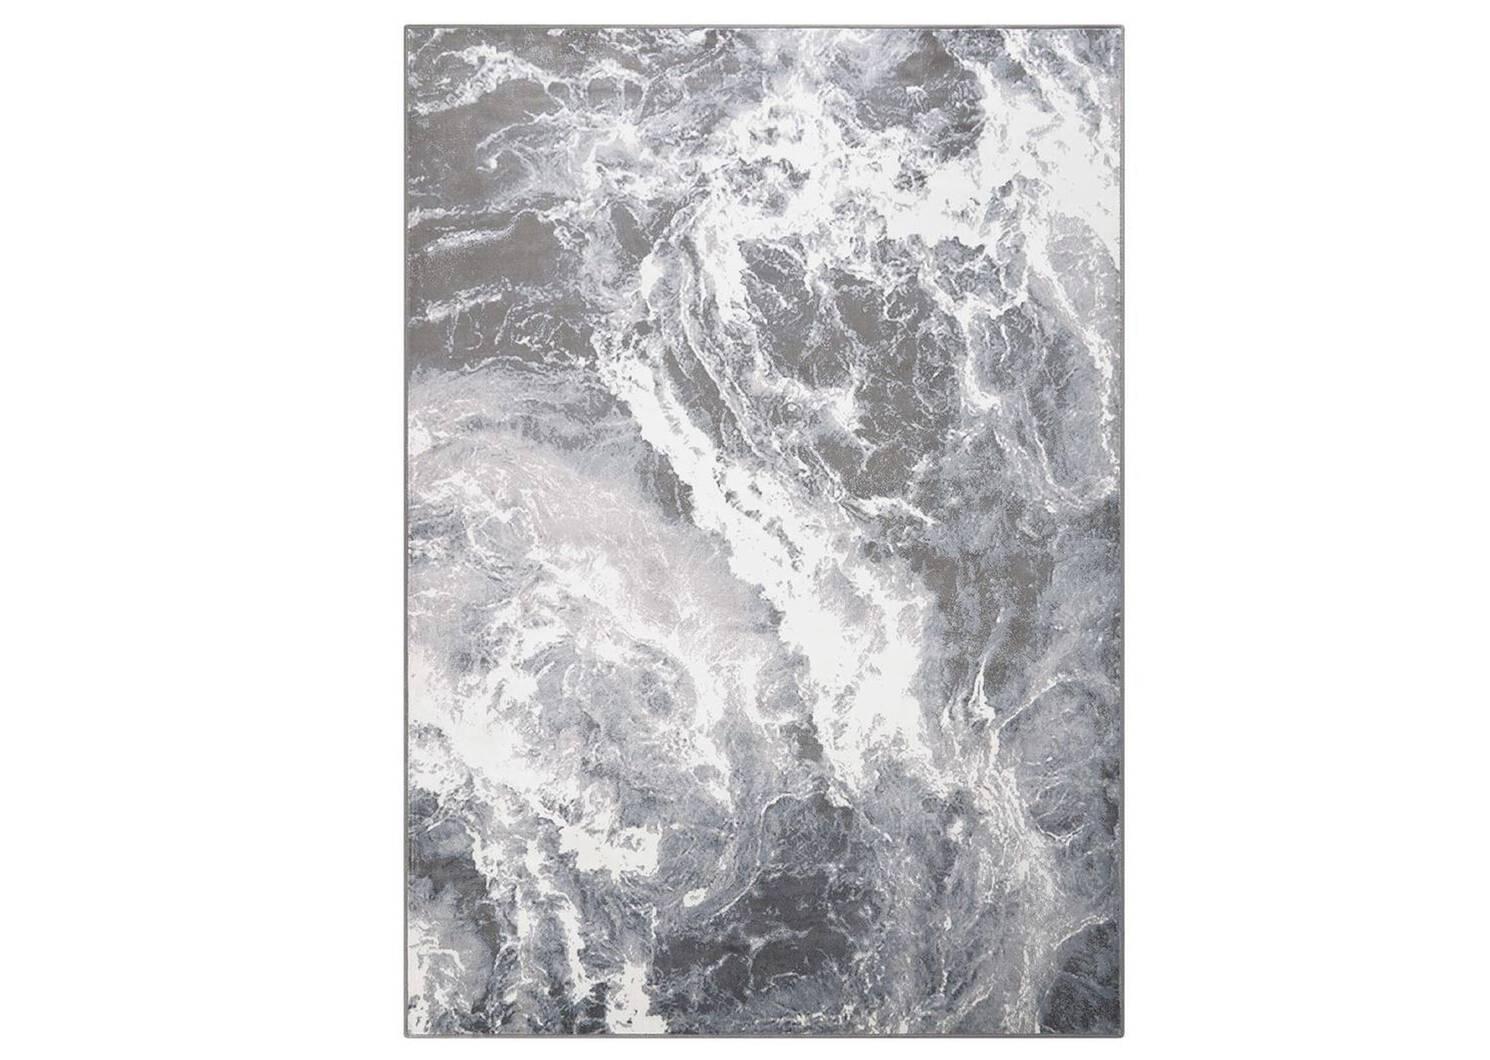 Thibault Rug 79x118 Natural/Grey